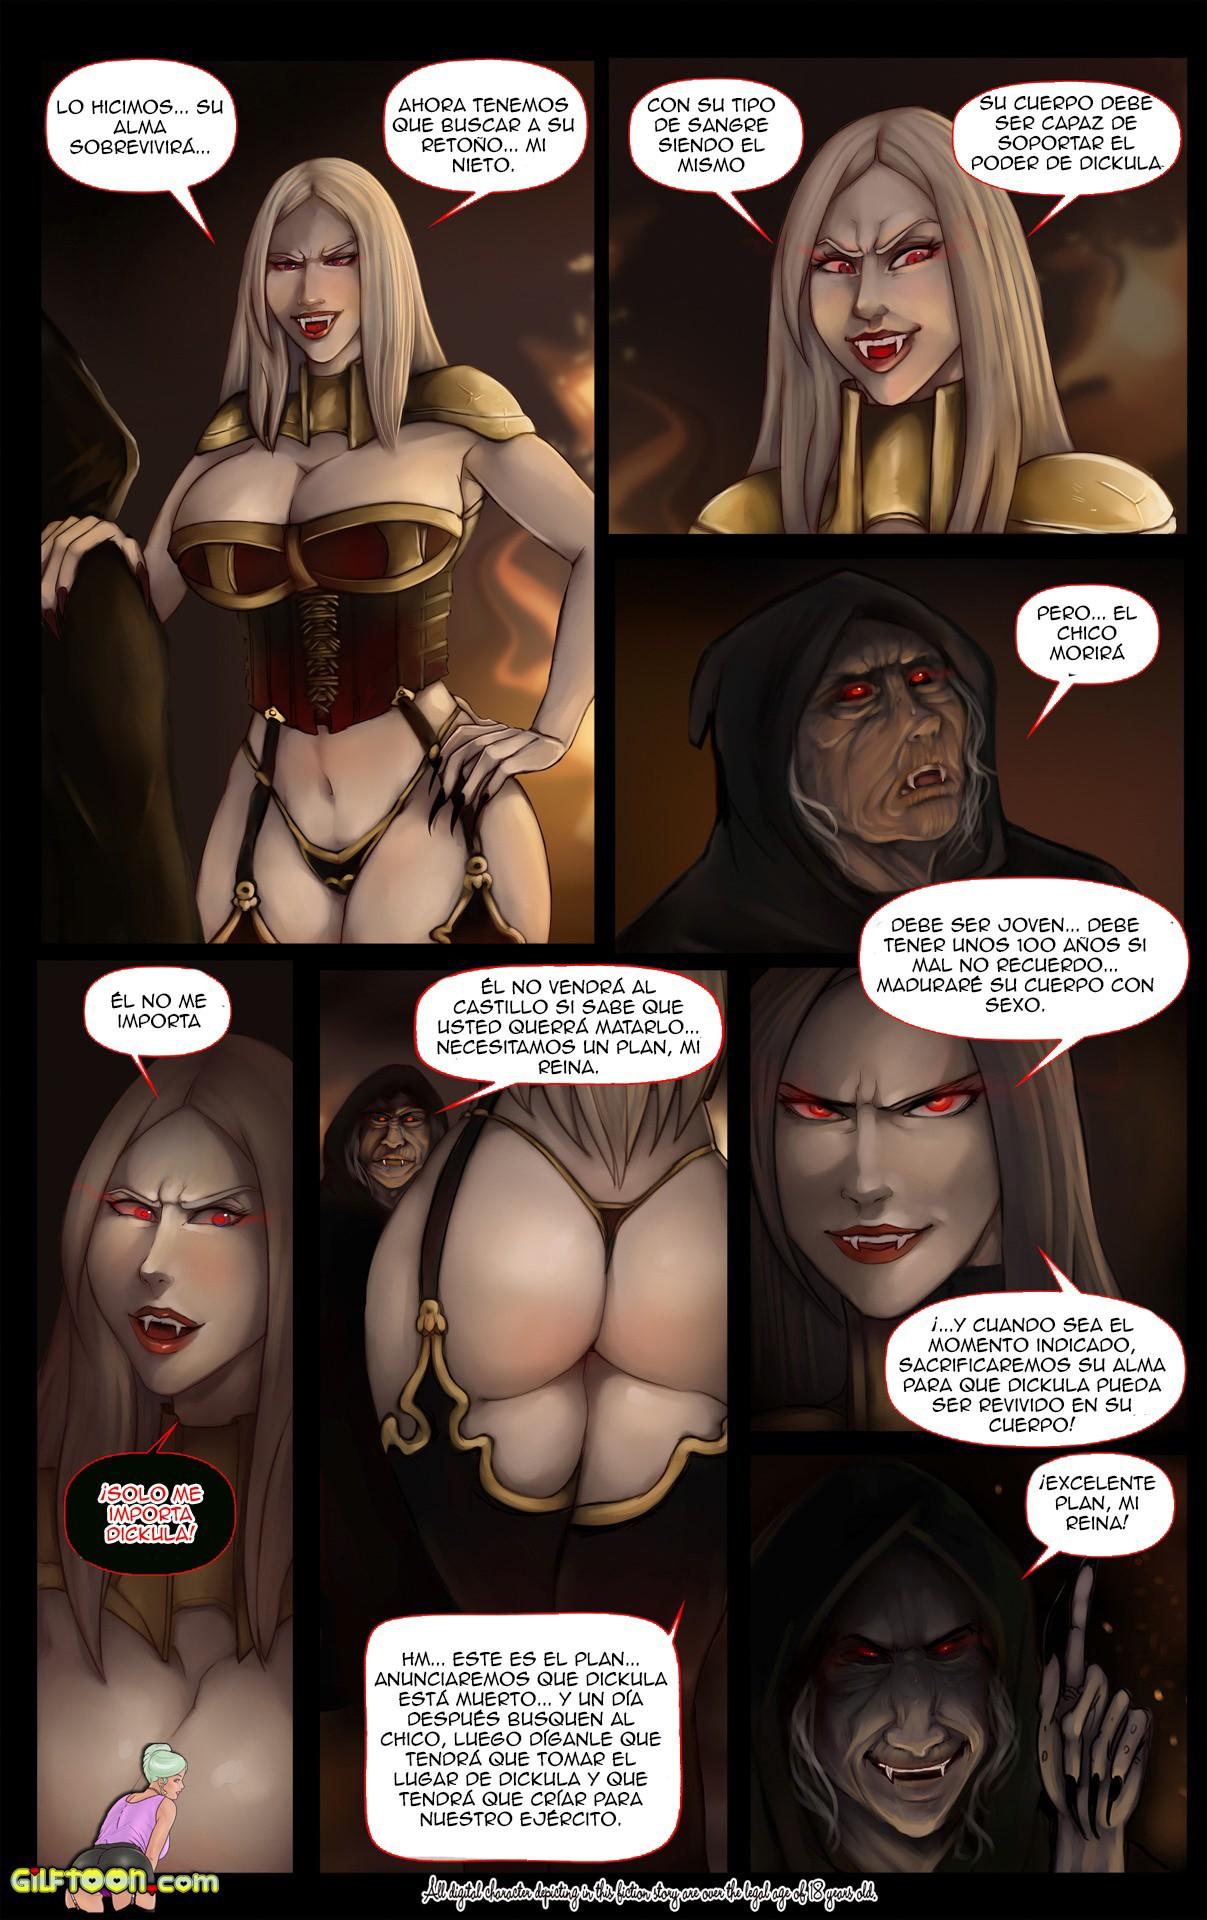 ver comics porno online